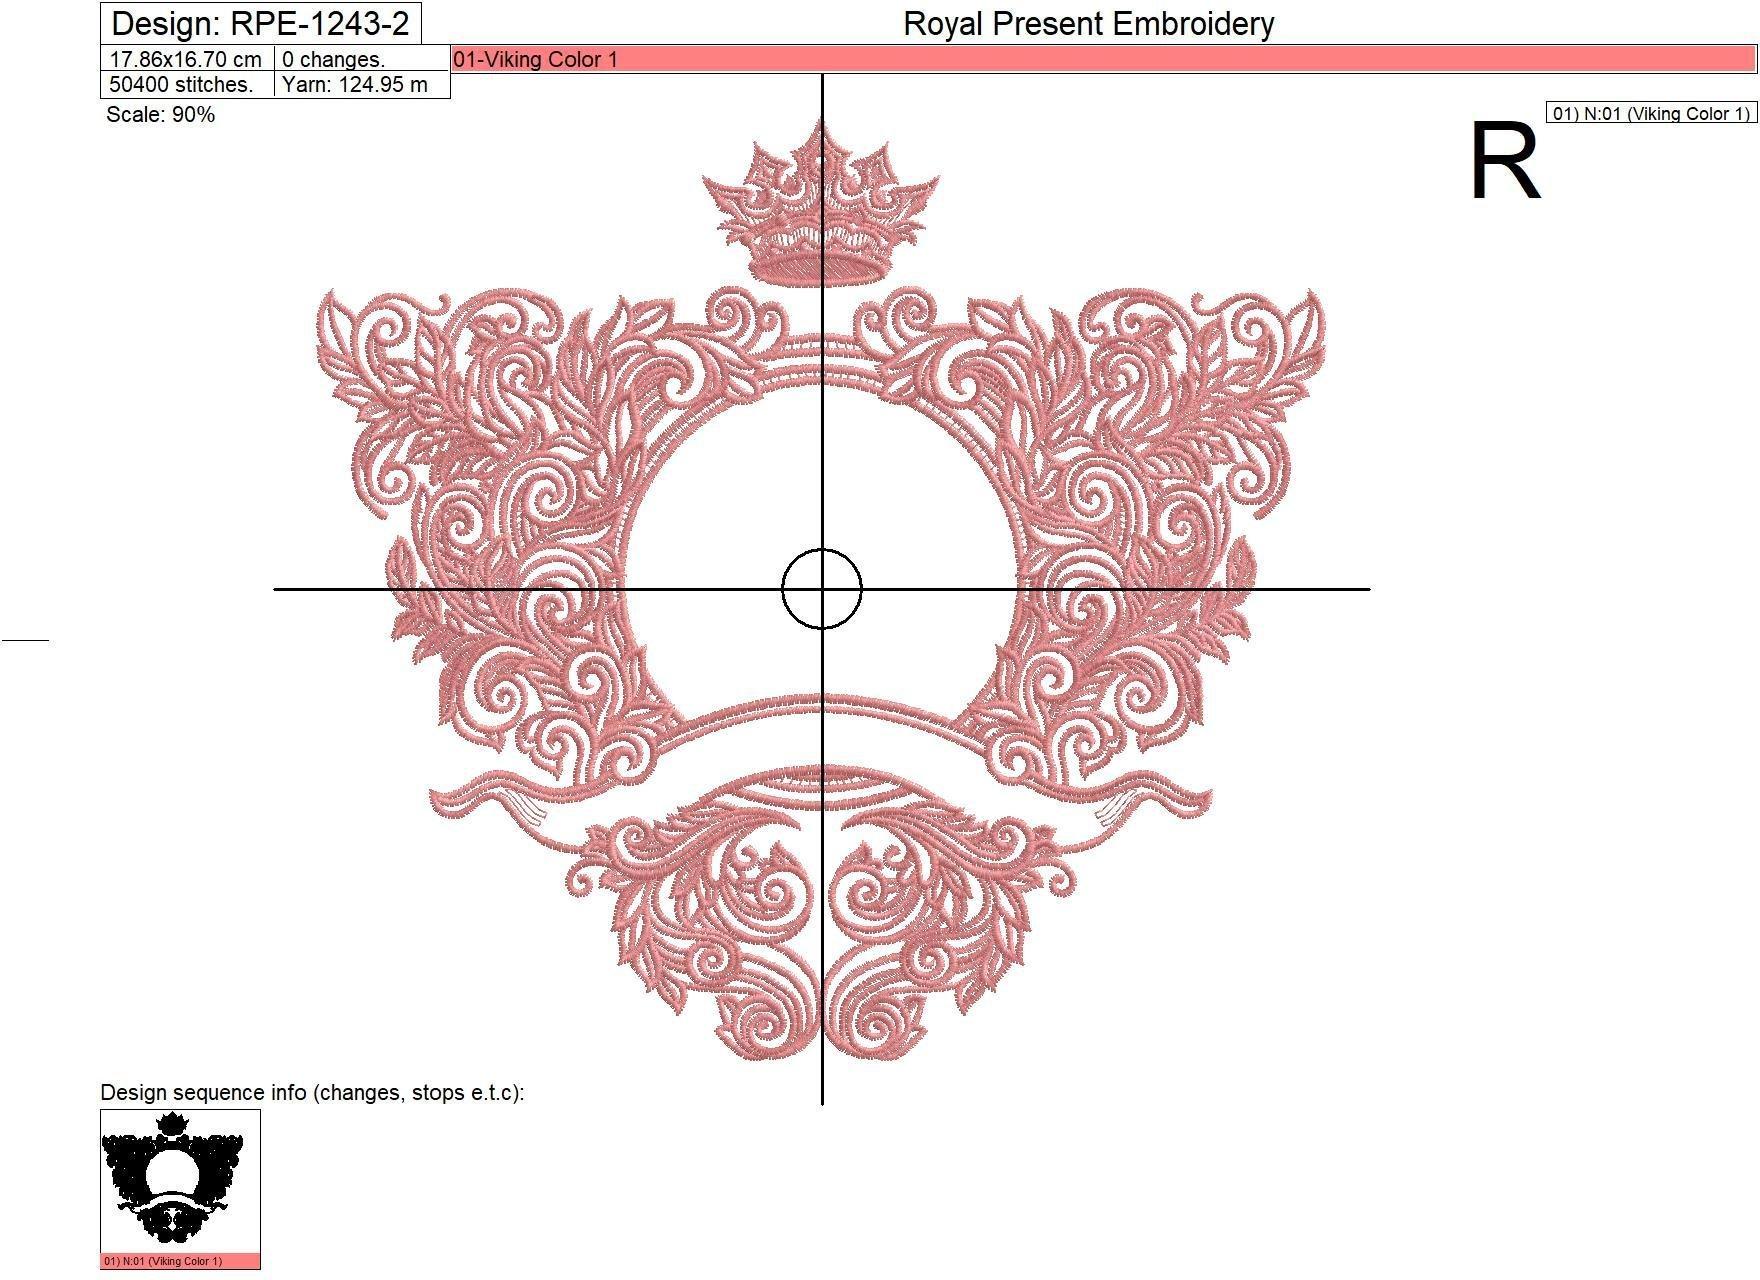 Ornate baroque monogram frame Embroidery Design - 4 sizes